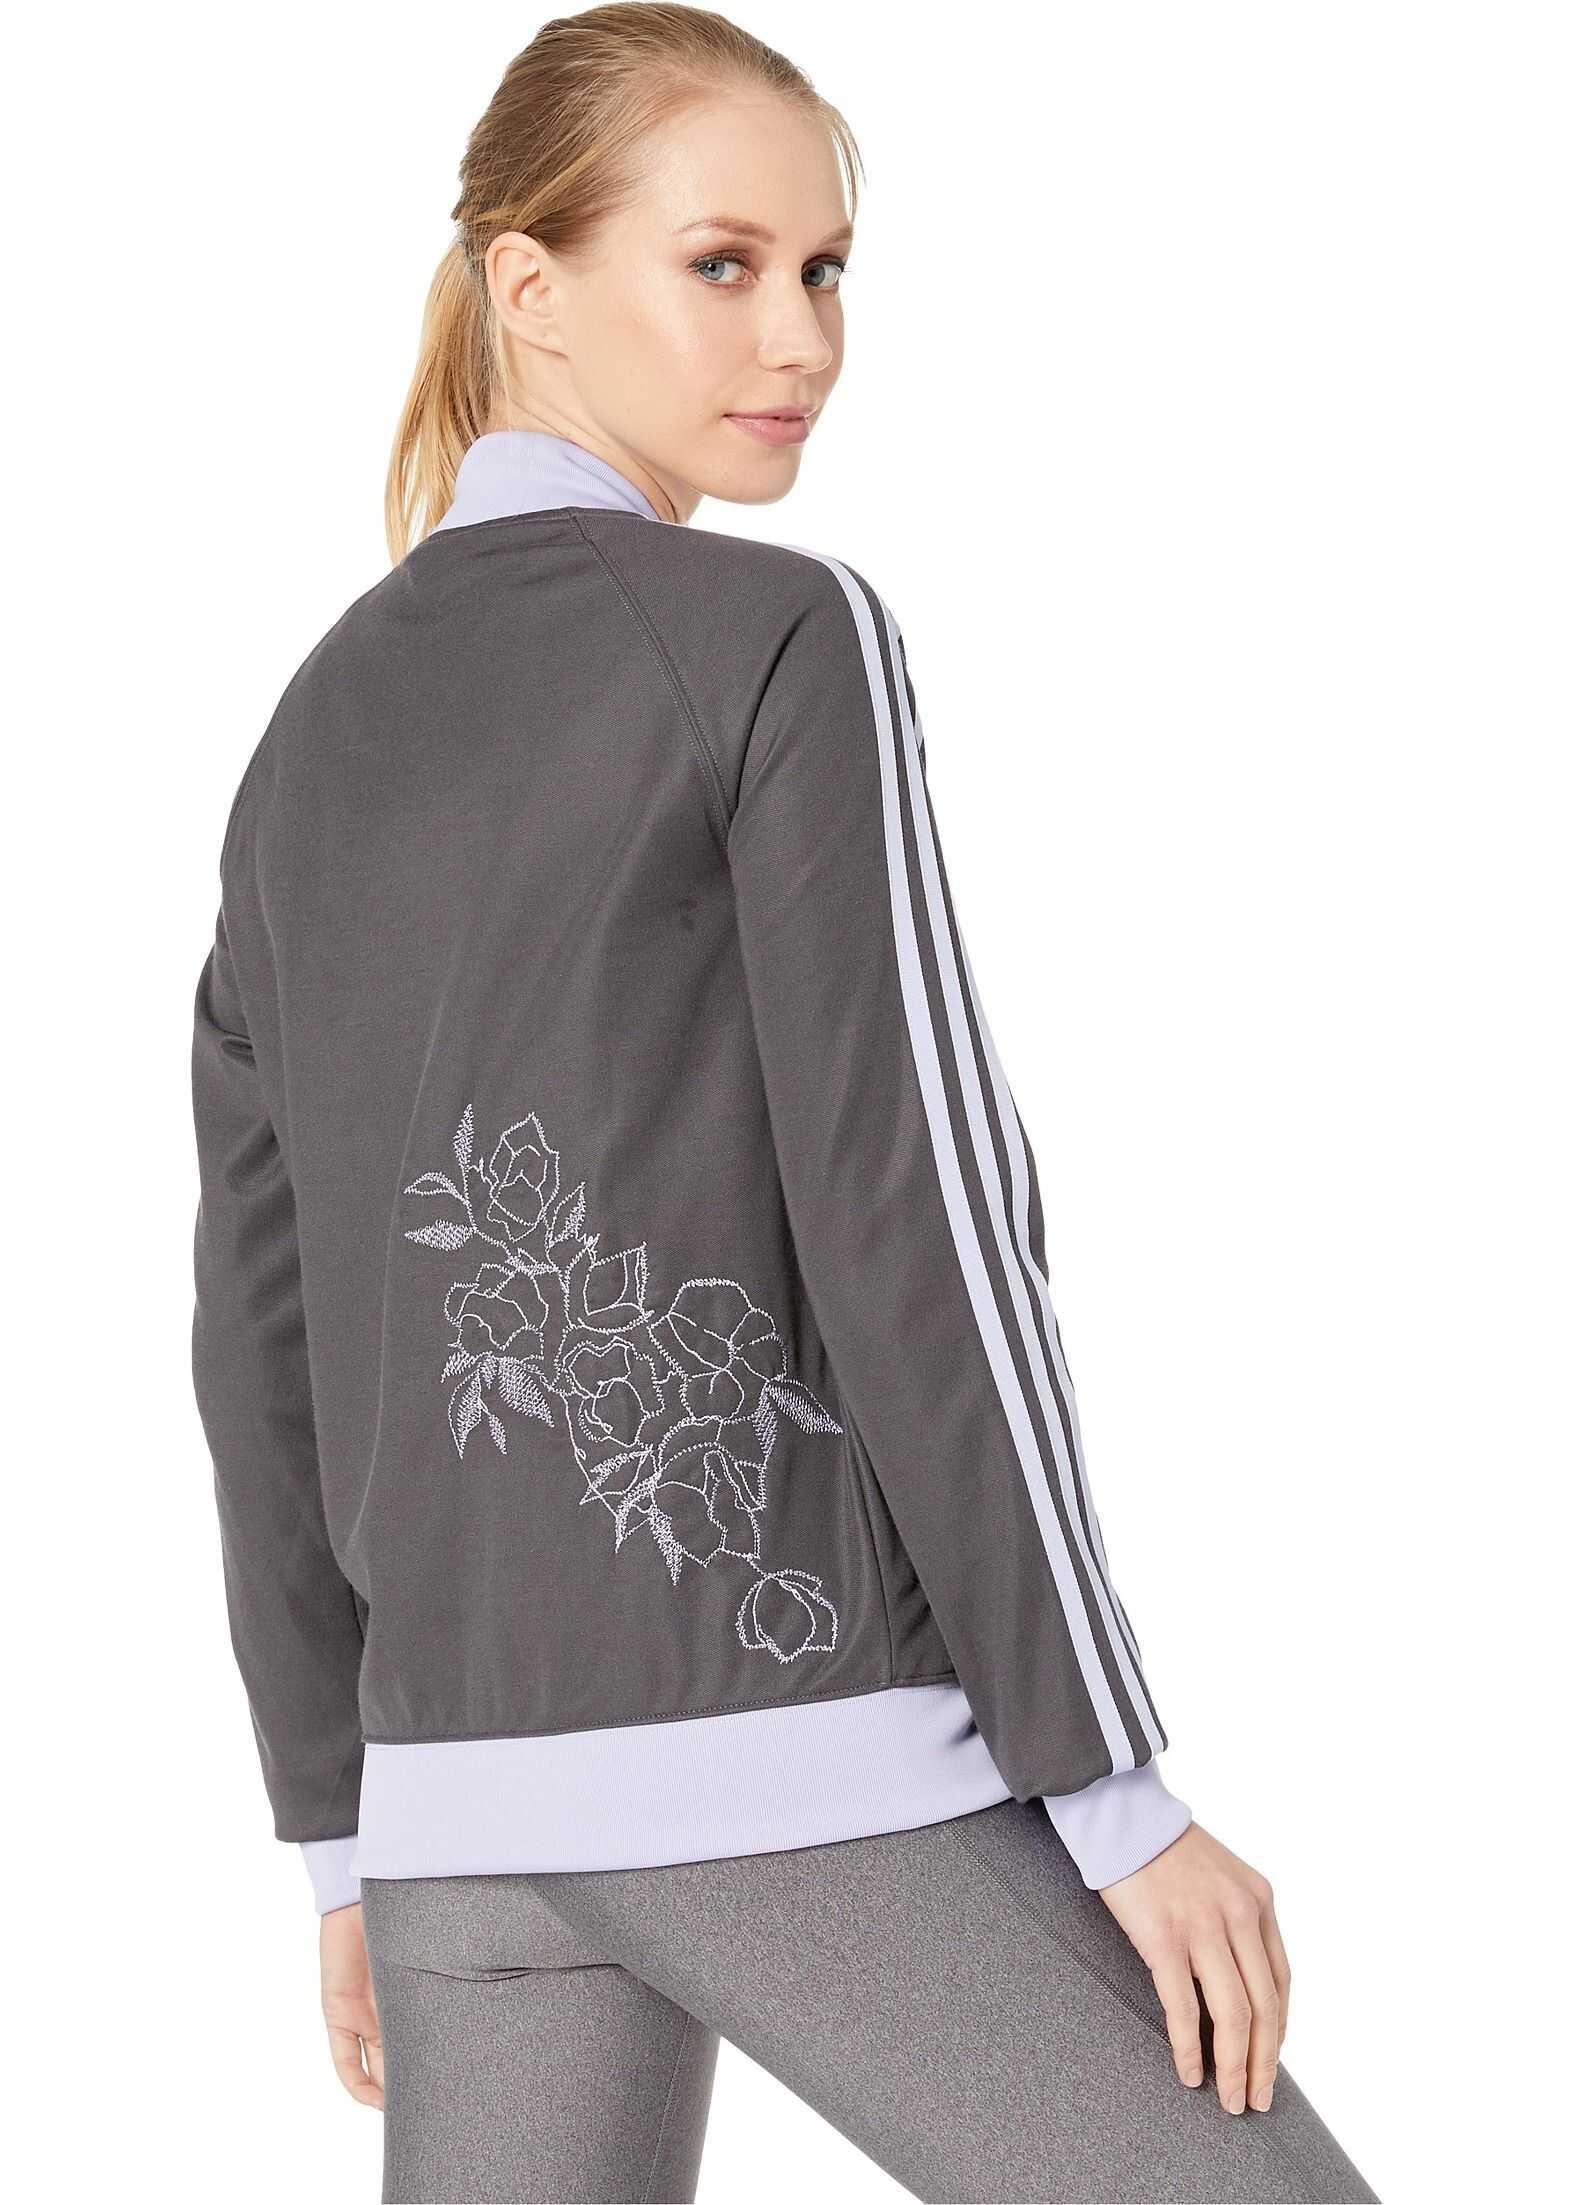 adidas Originals SST Track Jacket Grey Six